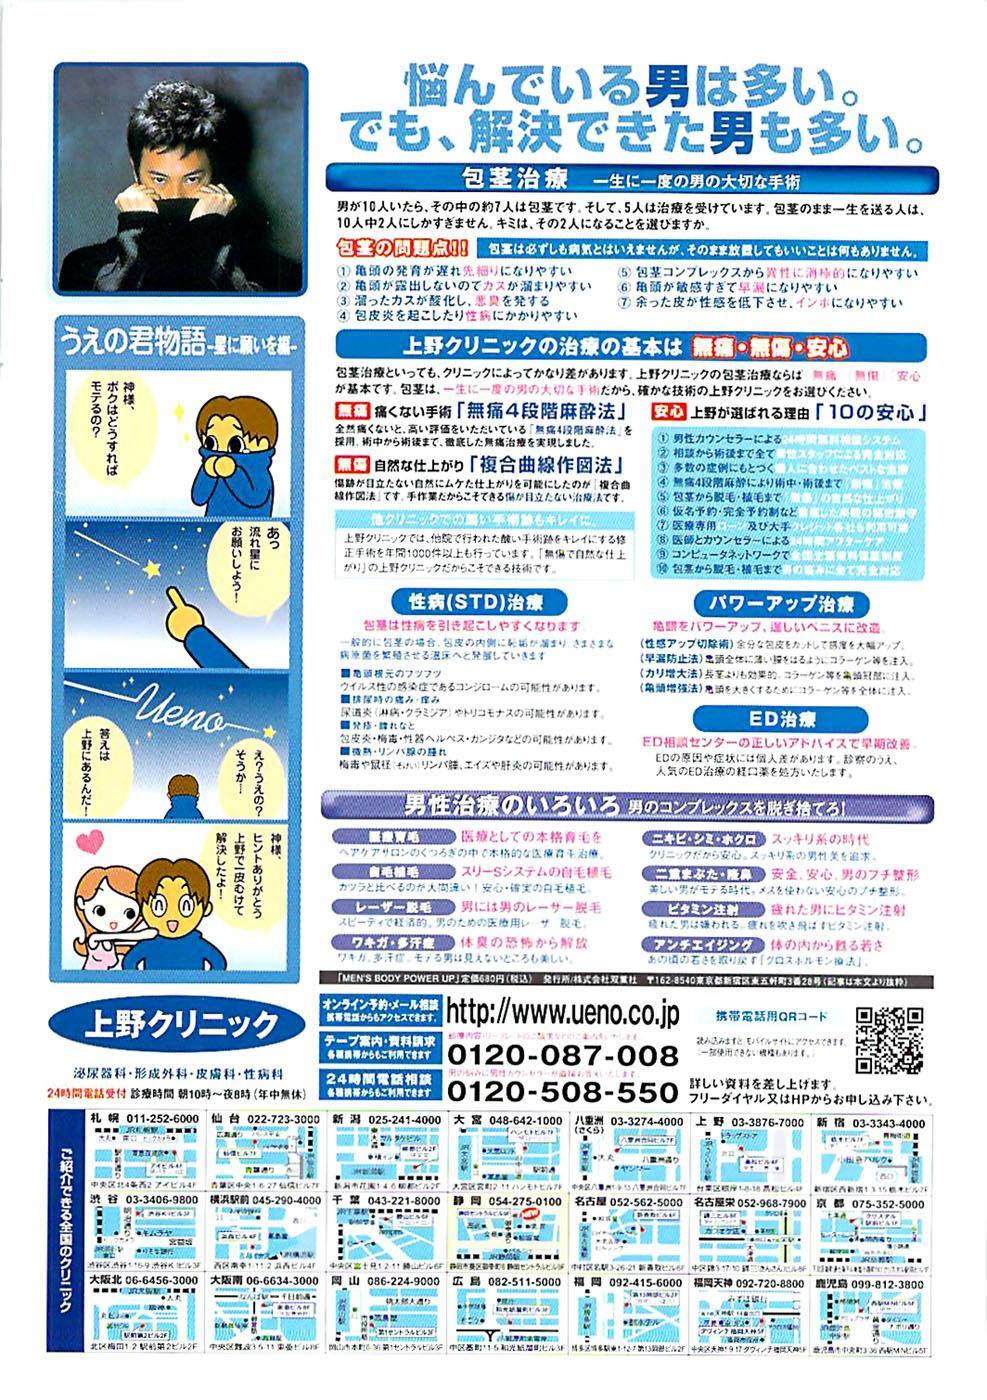 COMIC CanDoll 2007-03 Vol. 38 1